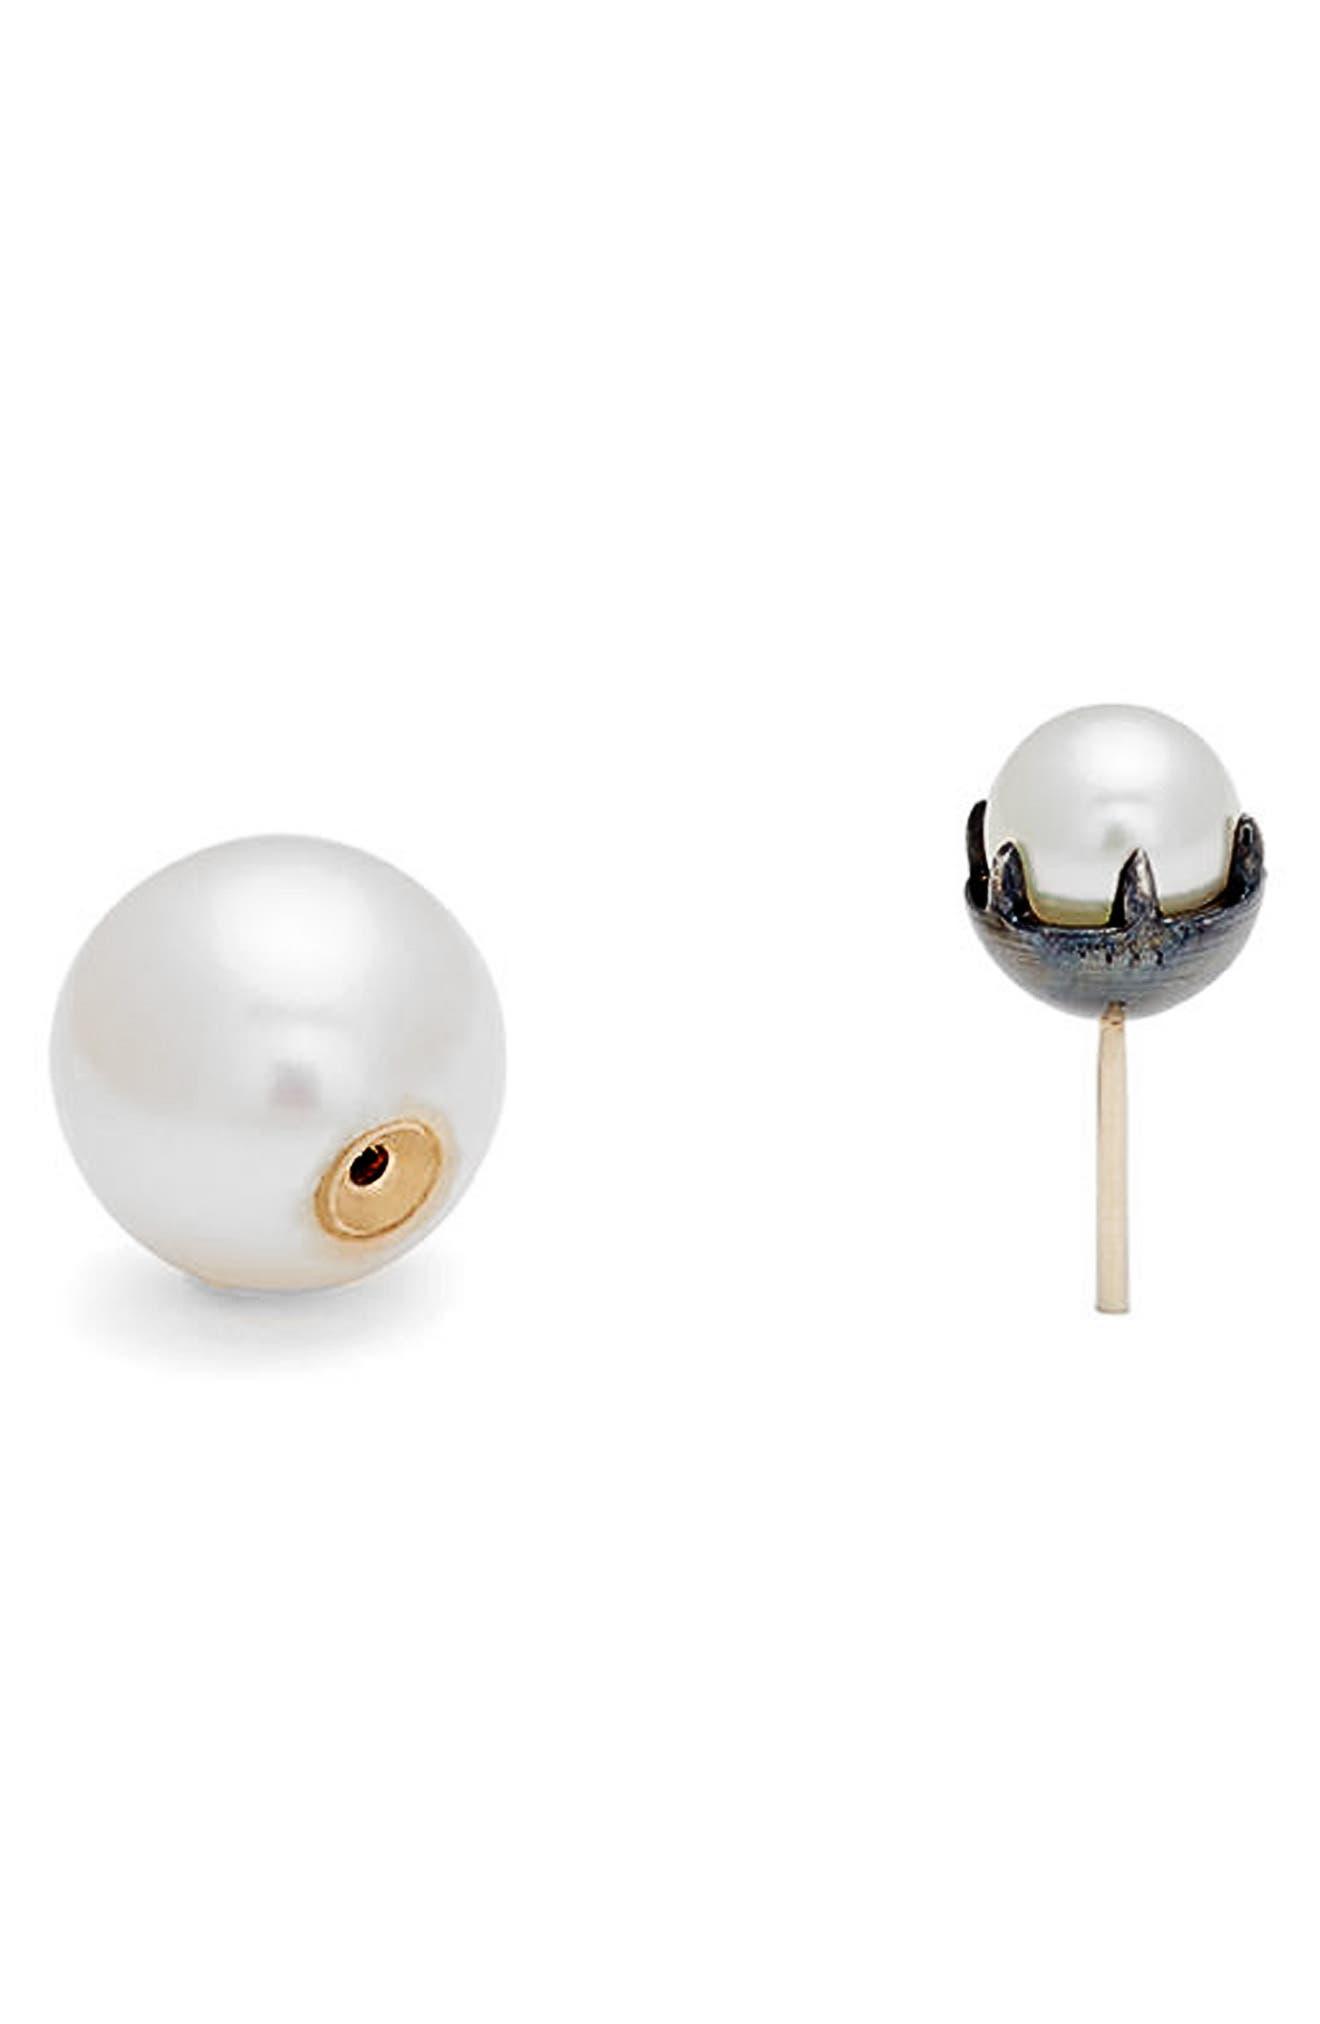 Akoya & Freshwater Pearl Double Stud Earrings,                             Alternate thumbnail 3, color,                             710